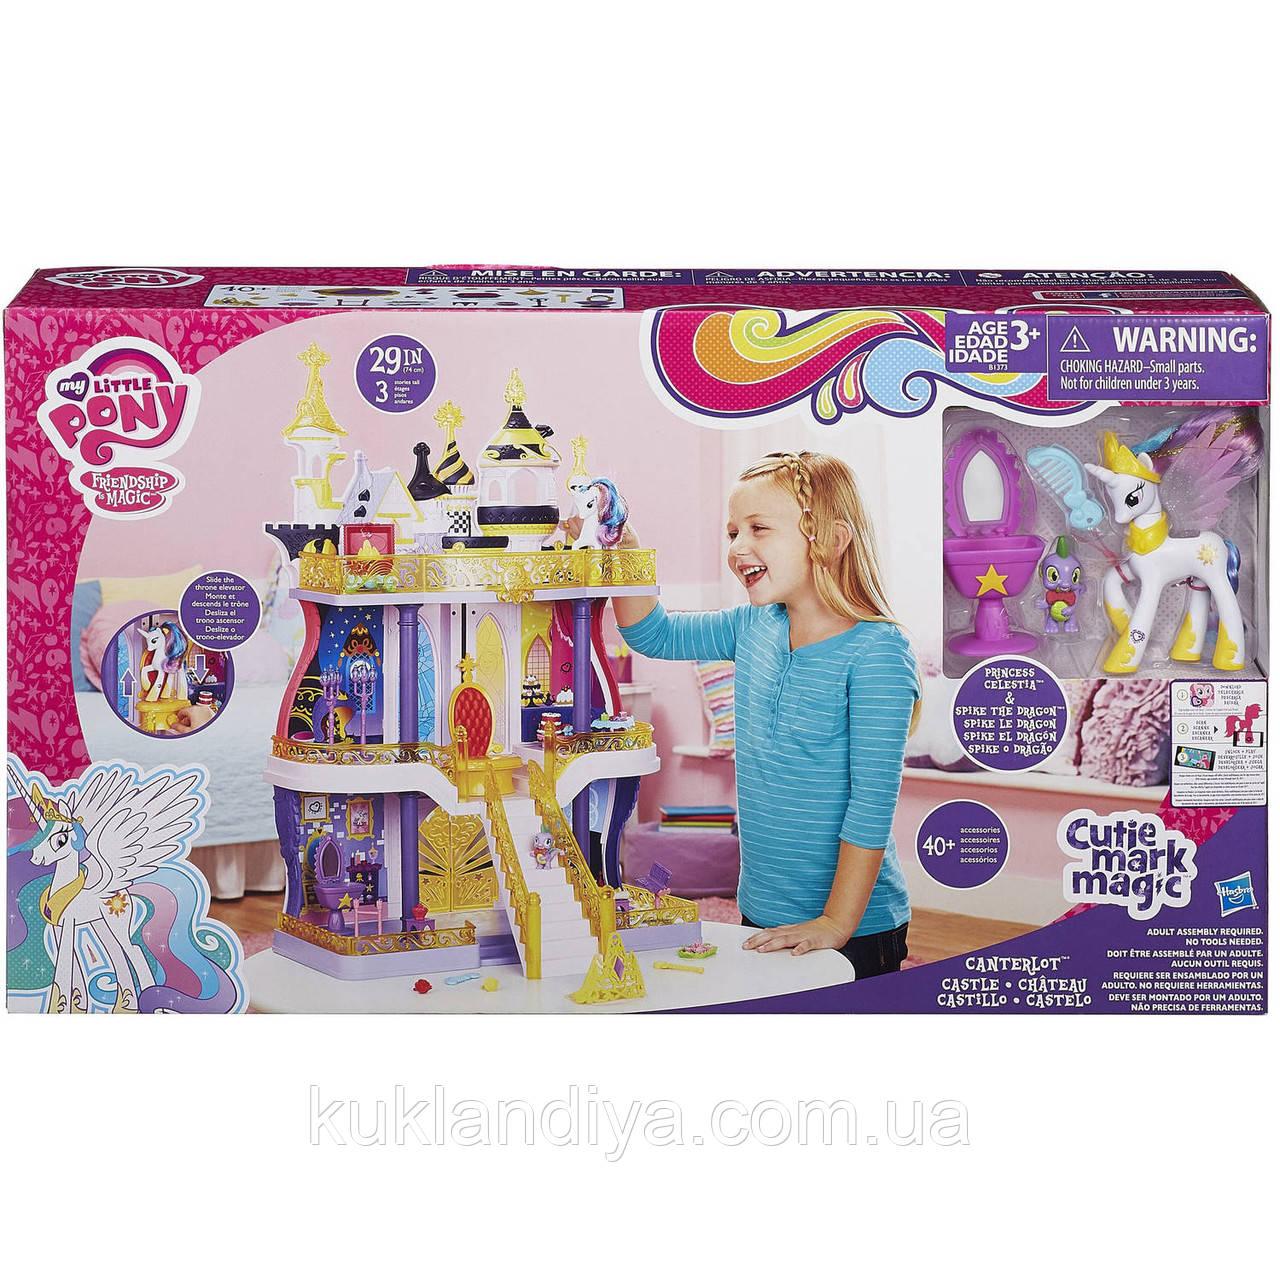 Замок Кантерлот My Little Pony - Cutie Mark Magic Canterlot Castle B1363